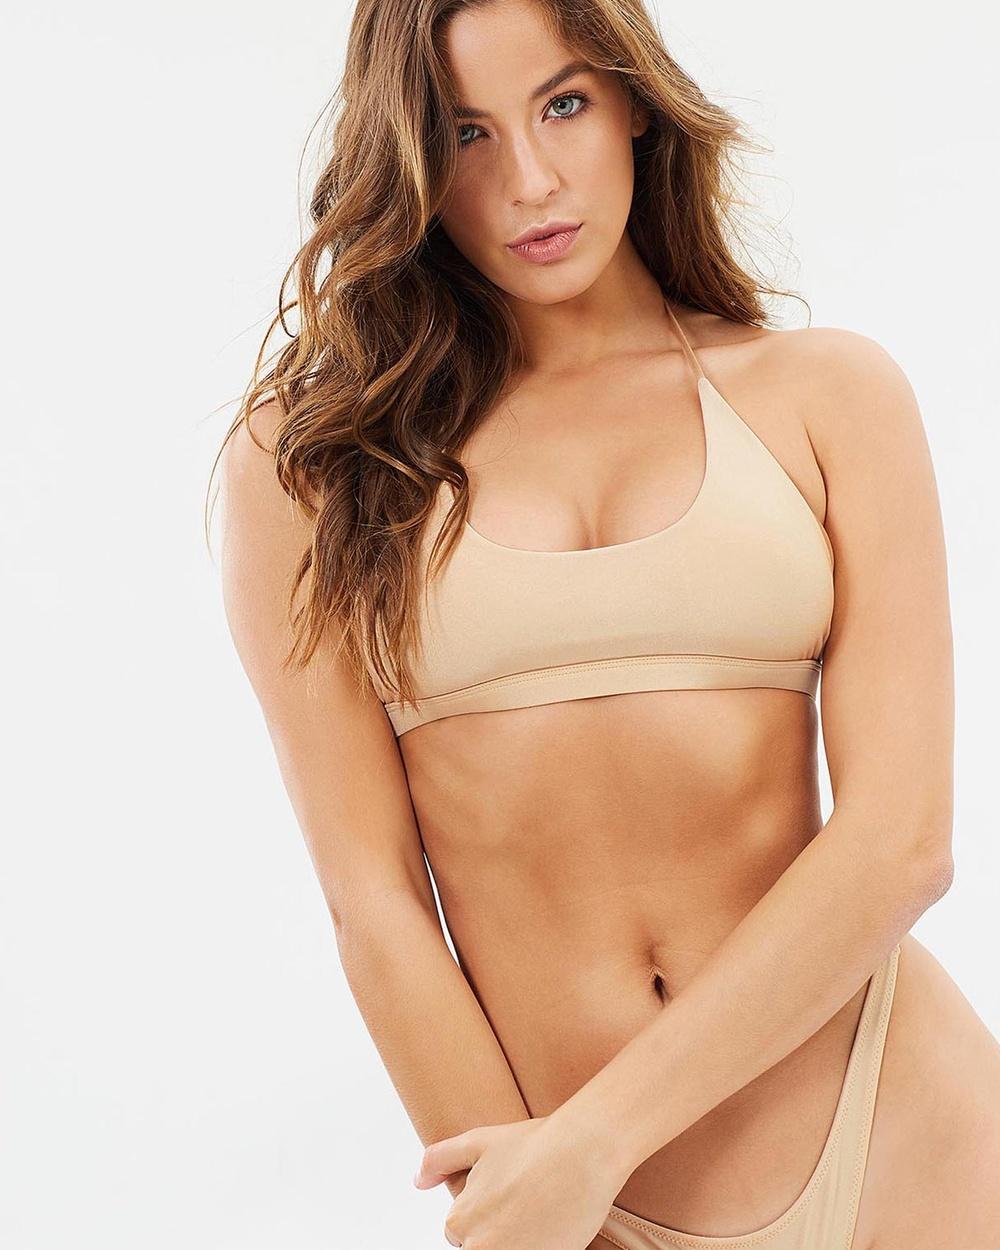 Buy We The Dreamrs Rizzoli Bikini Top Bikini Tops Nude Rizzoli Bikini Top -  shop We The Dreamrs swimwear online